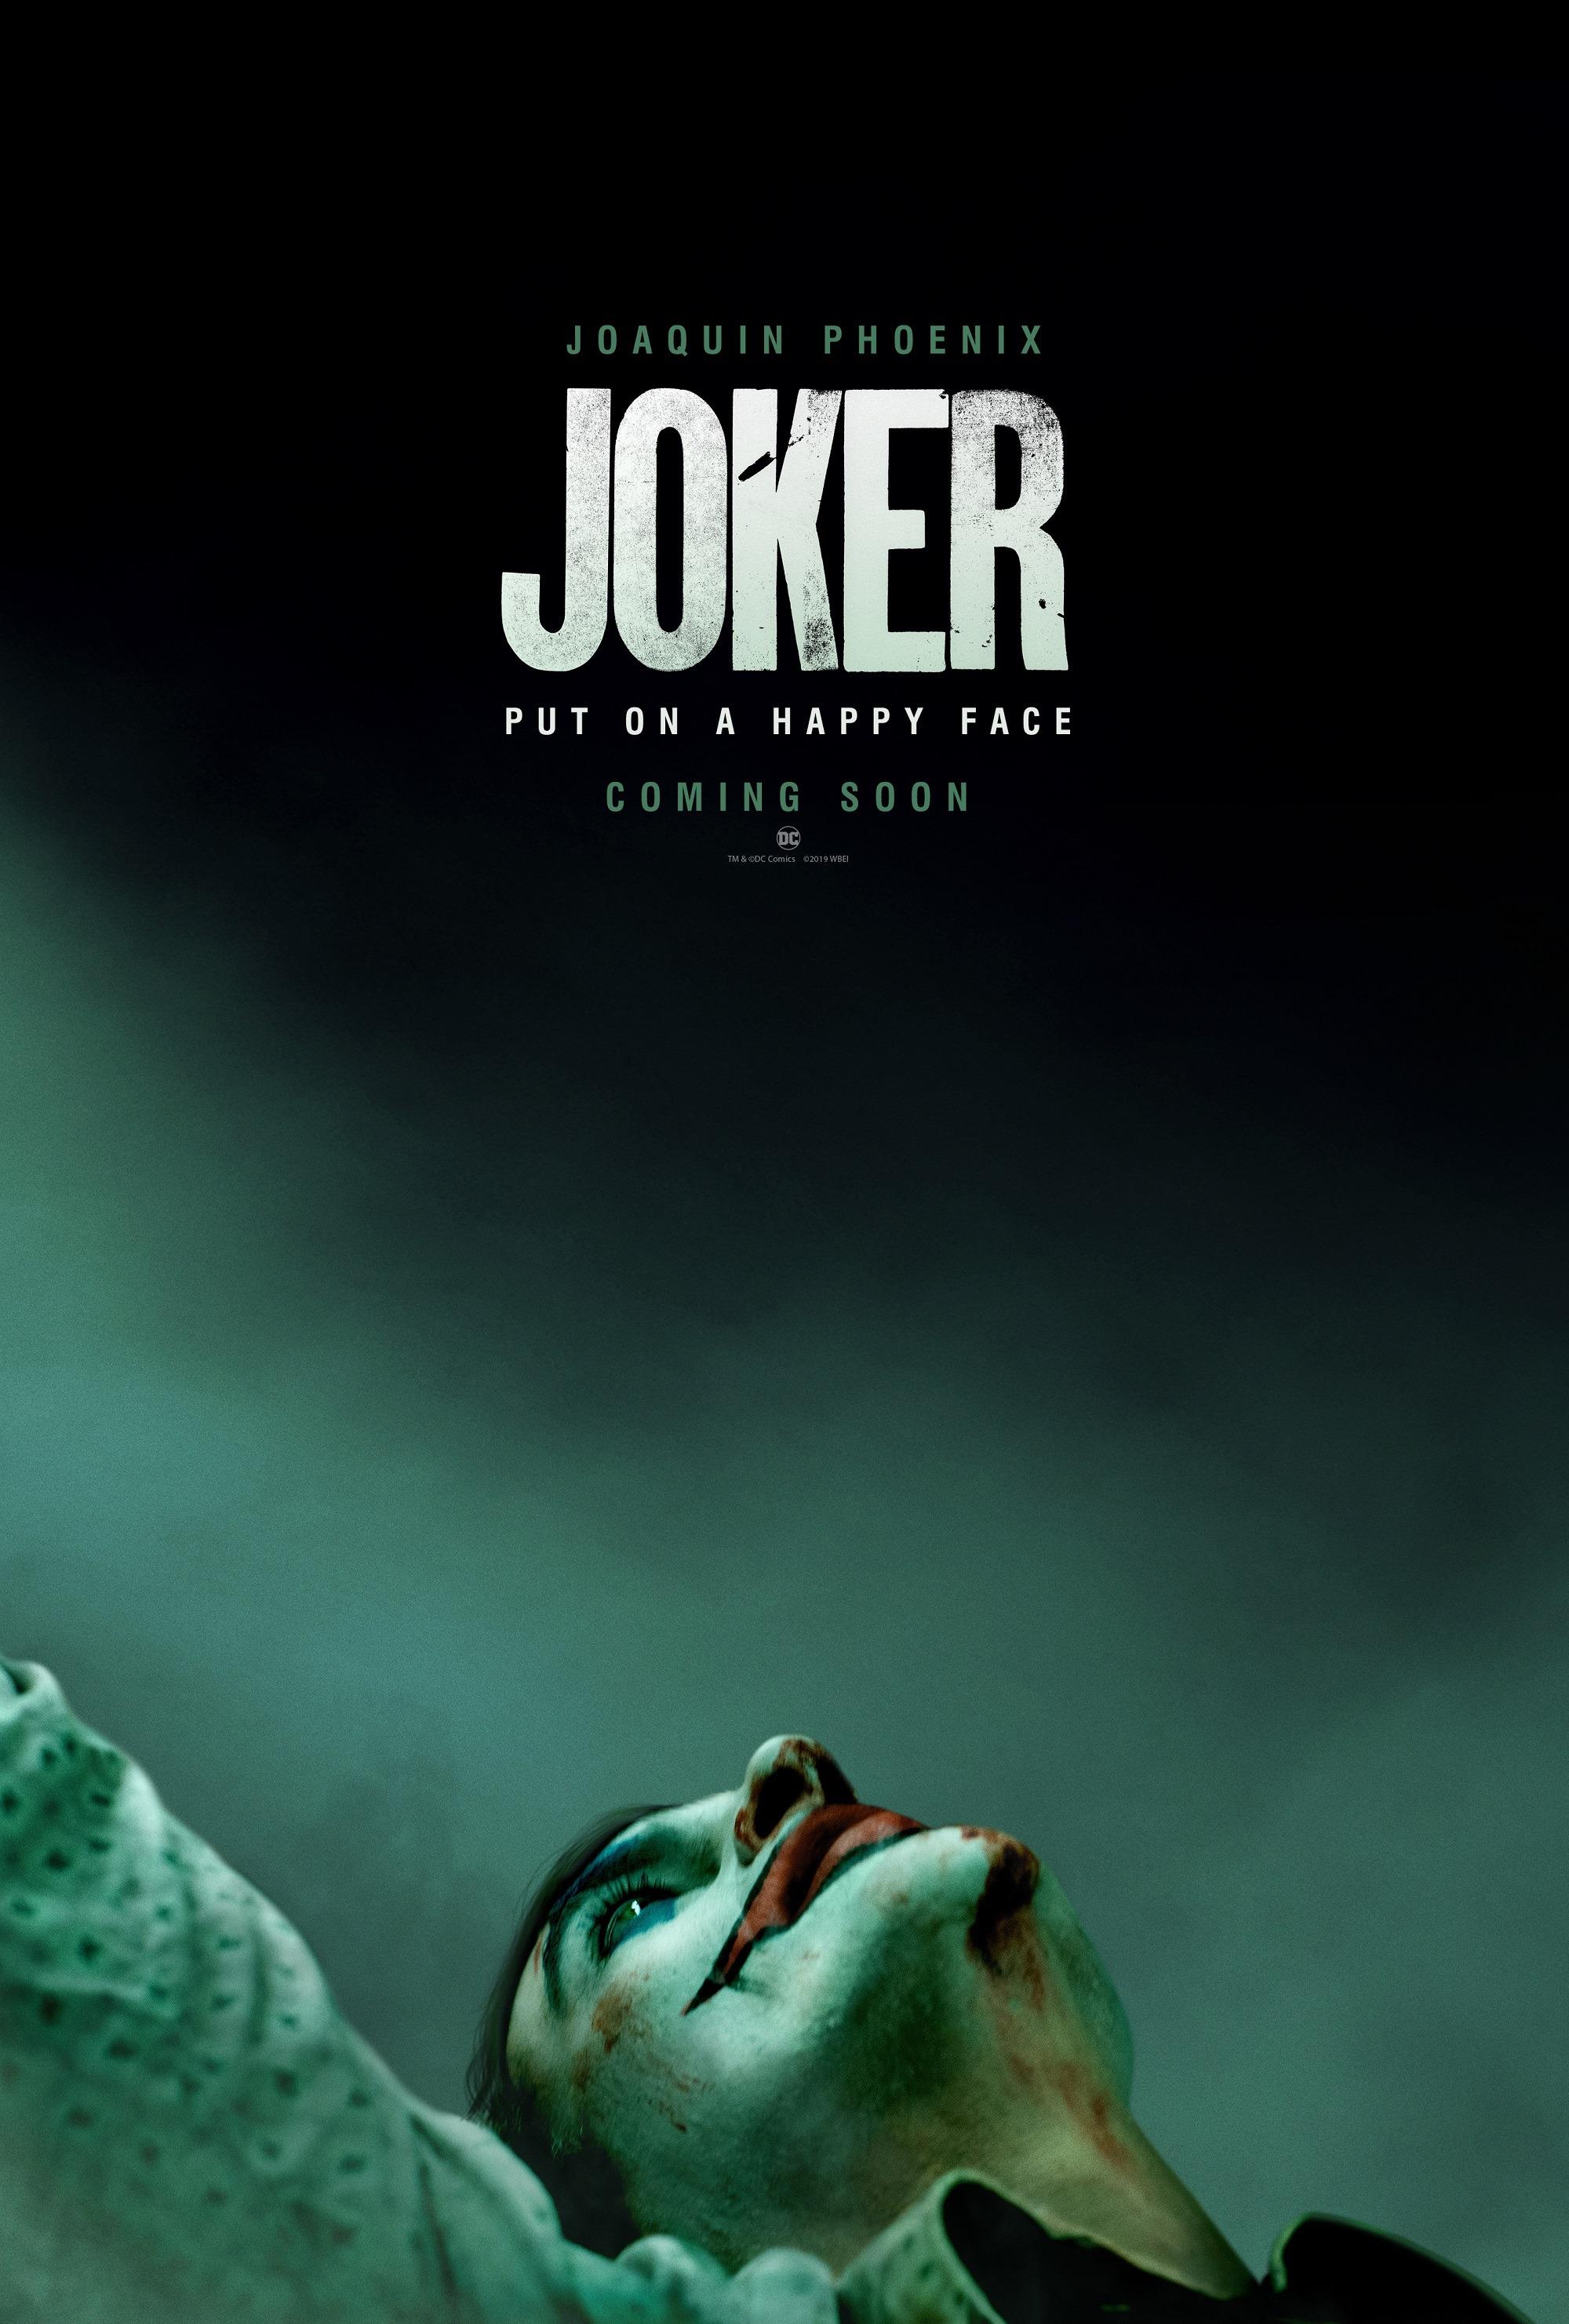 joker_p1.png